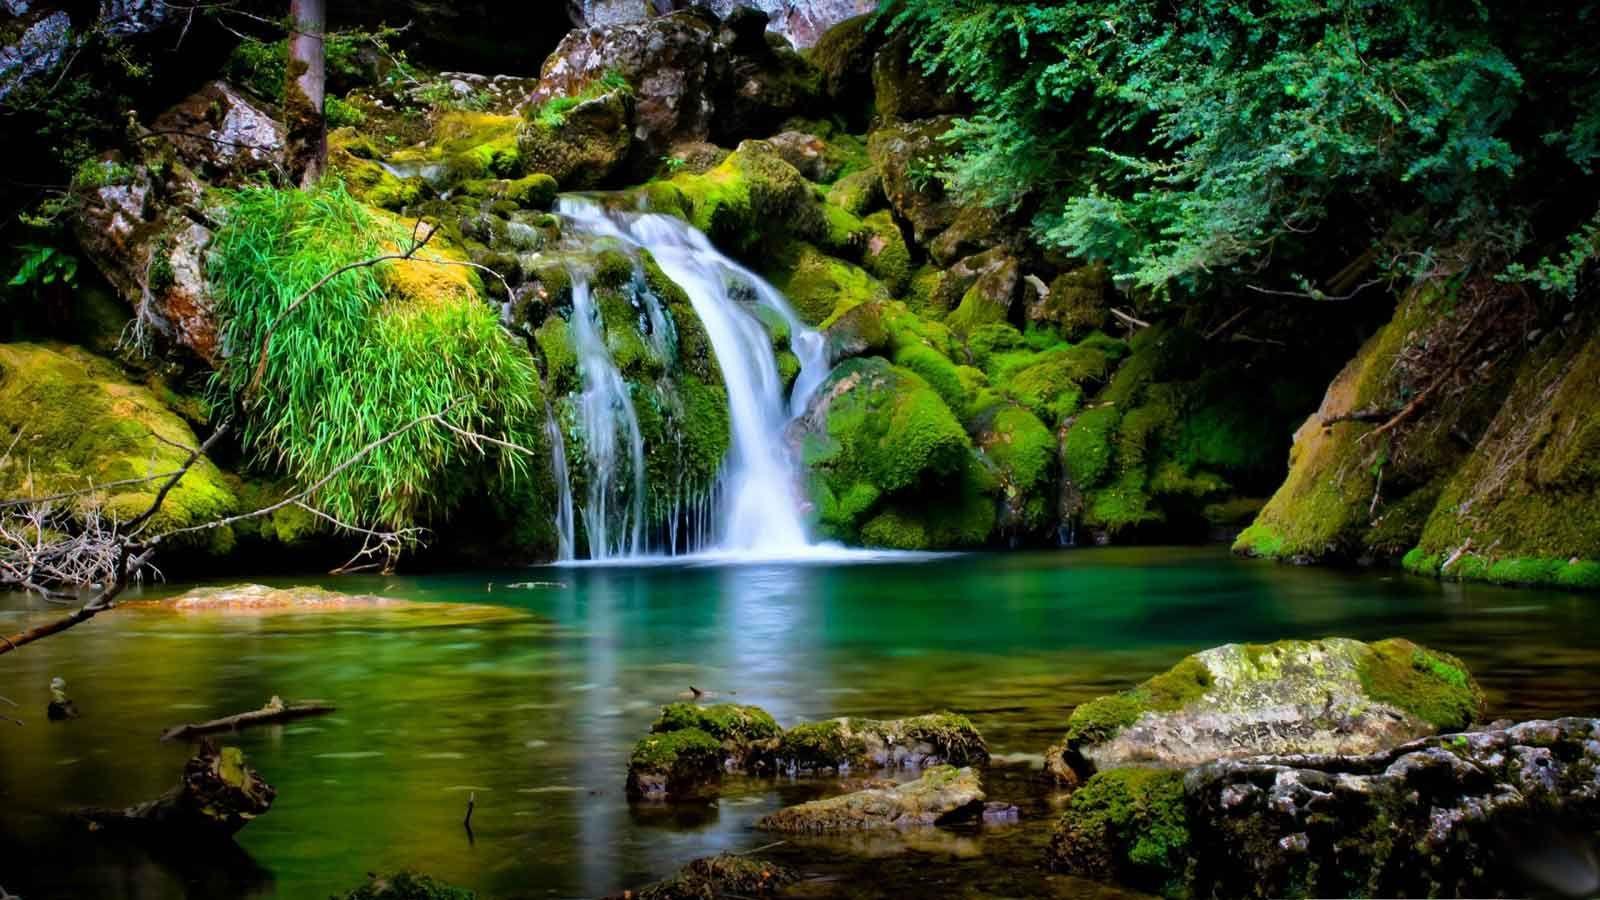 Fondos De Paisajes Hermosos Para Pantalla Hd 2 Hd: Paisajes De Naturaleza Gratis Para Pantalla Hd 2 HD